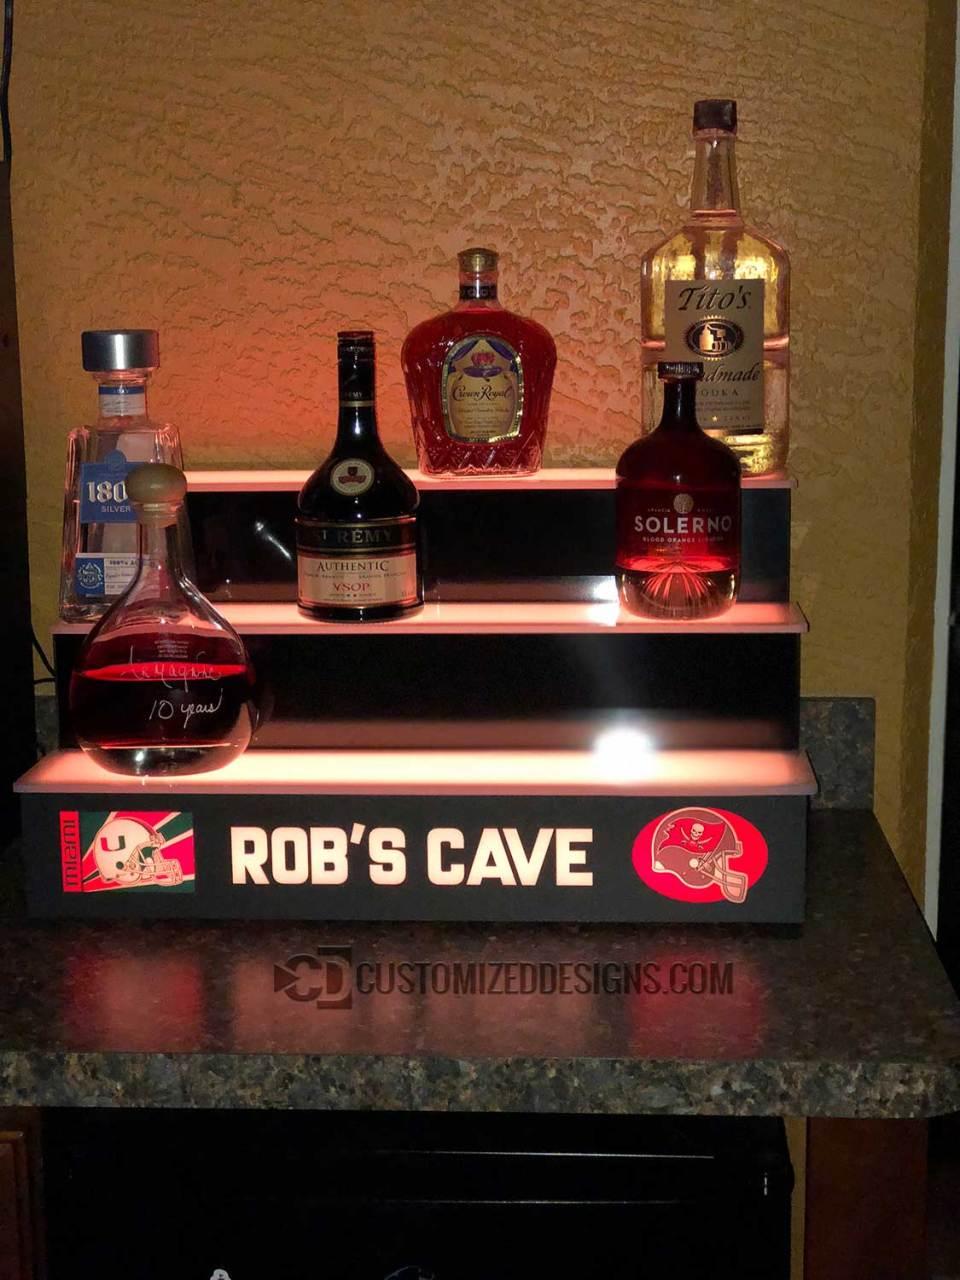 3 Step Home Bar Display - Miami Hurricans & Tampa Bay Buccaneers